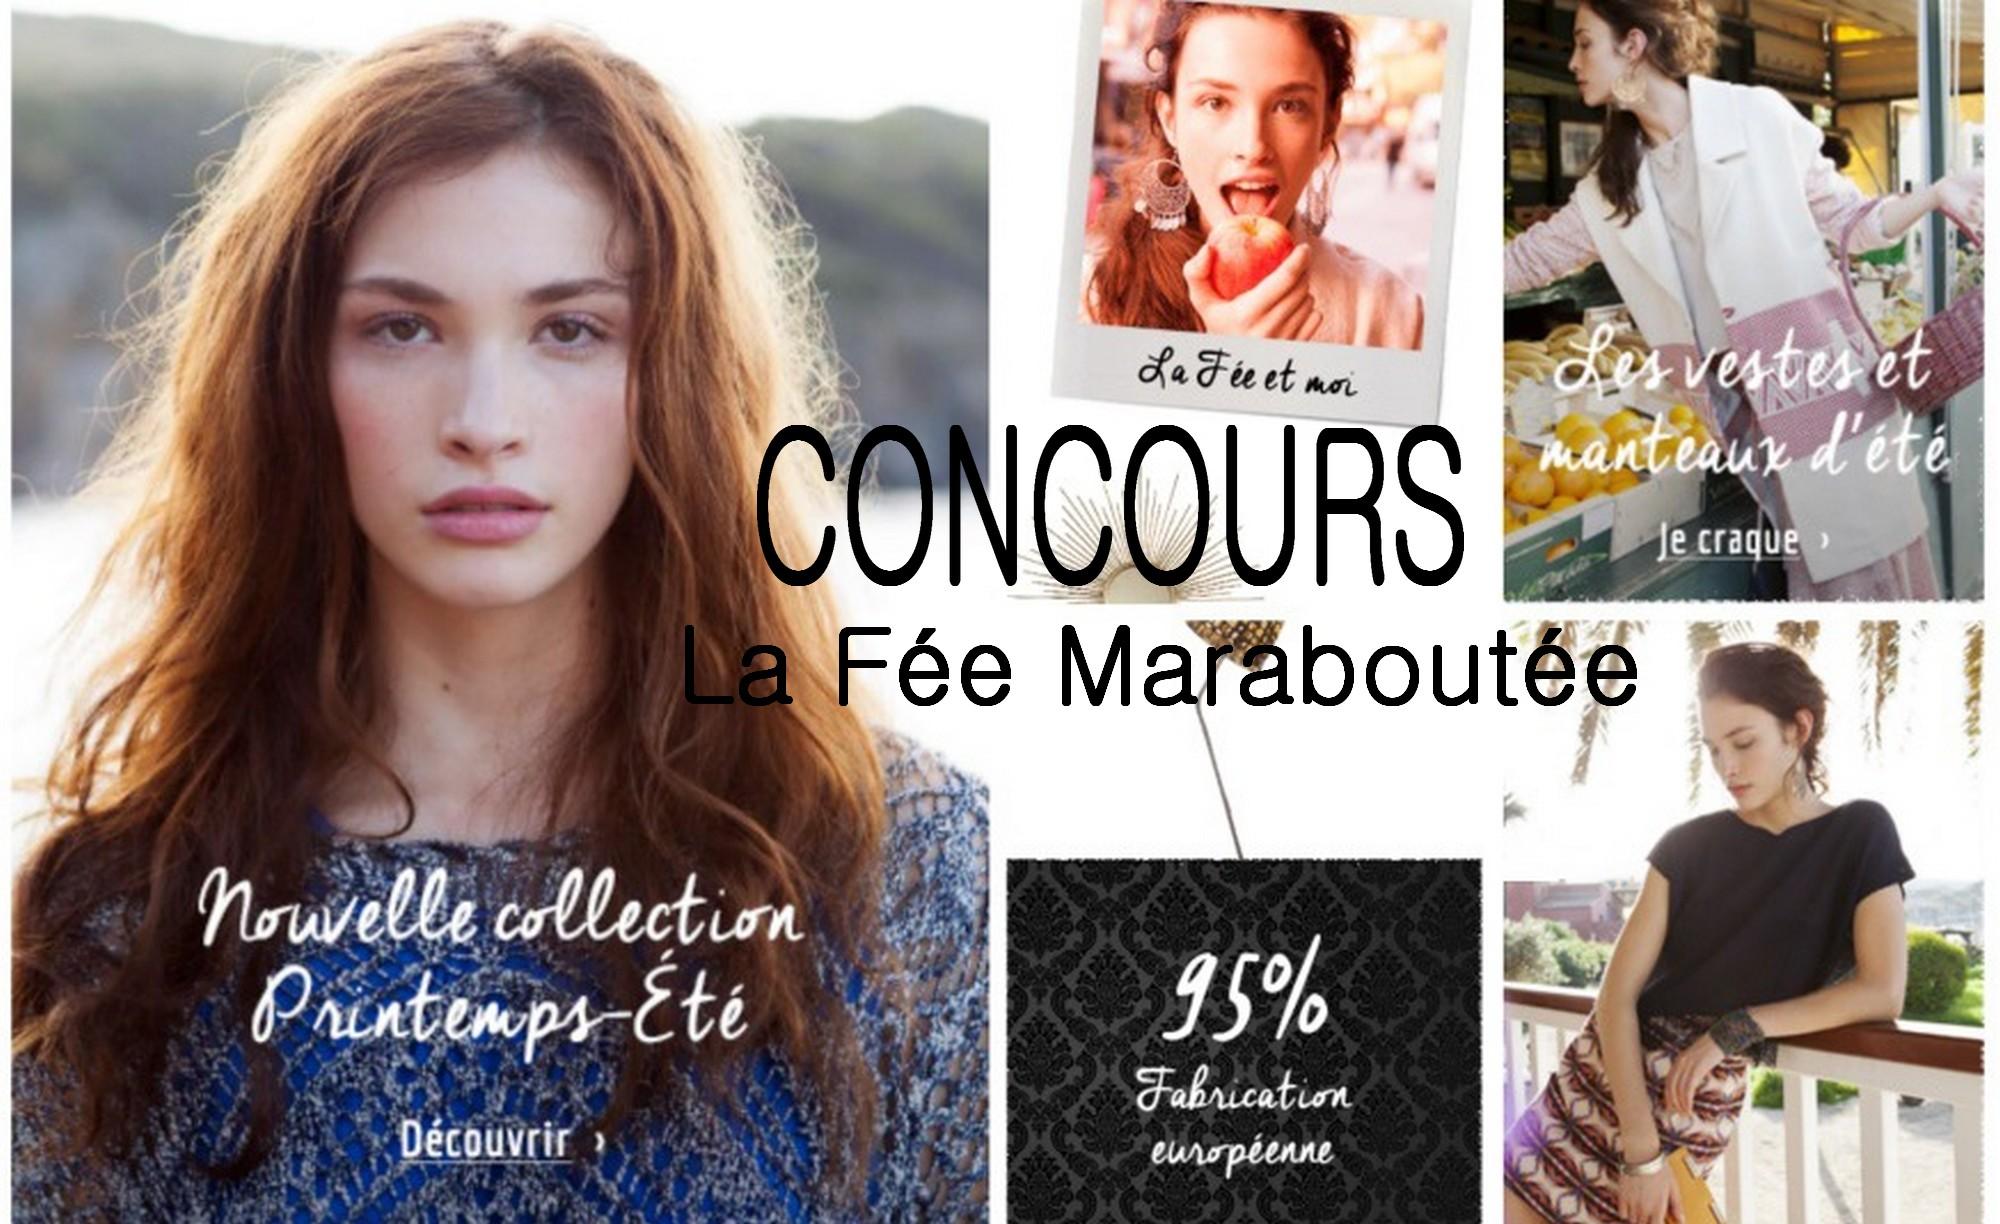 la-fee-maraboutee-874x535